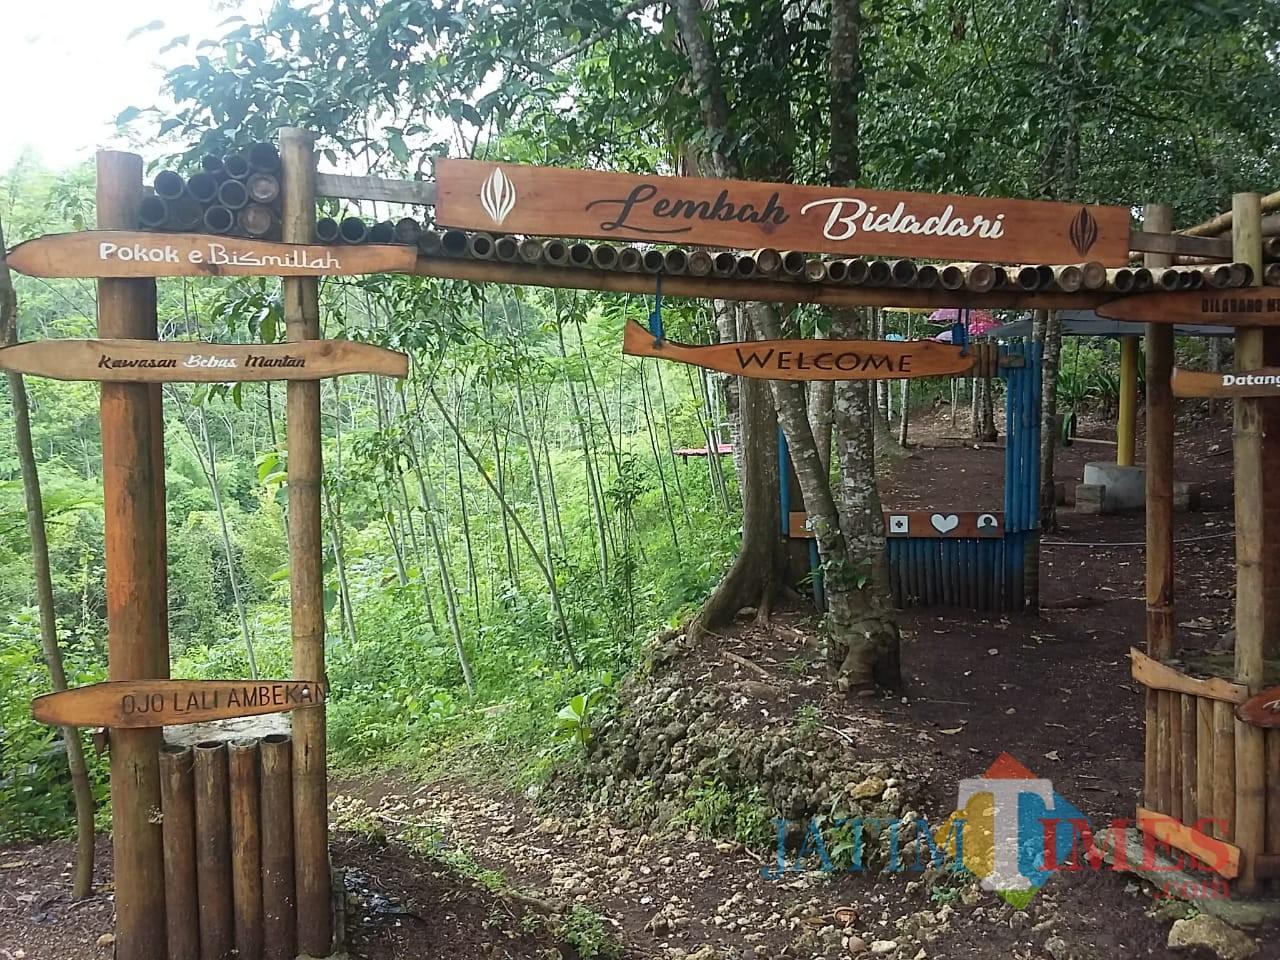 Lembah Bidadari, Pagak, wisata yang diminta Wabup Malang menjadi wisata bertaraf nasional (Humas for MalangTIMES)